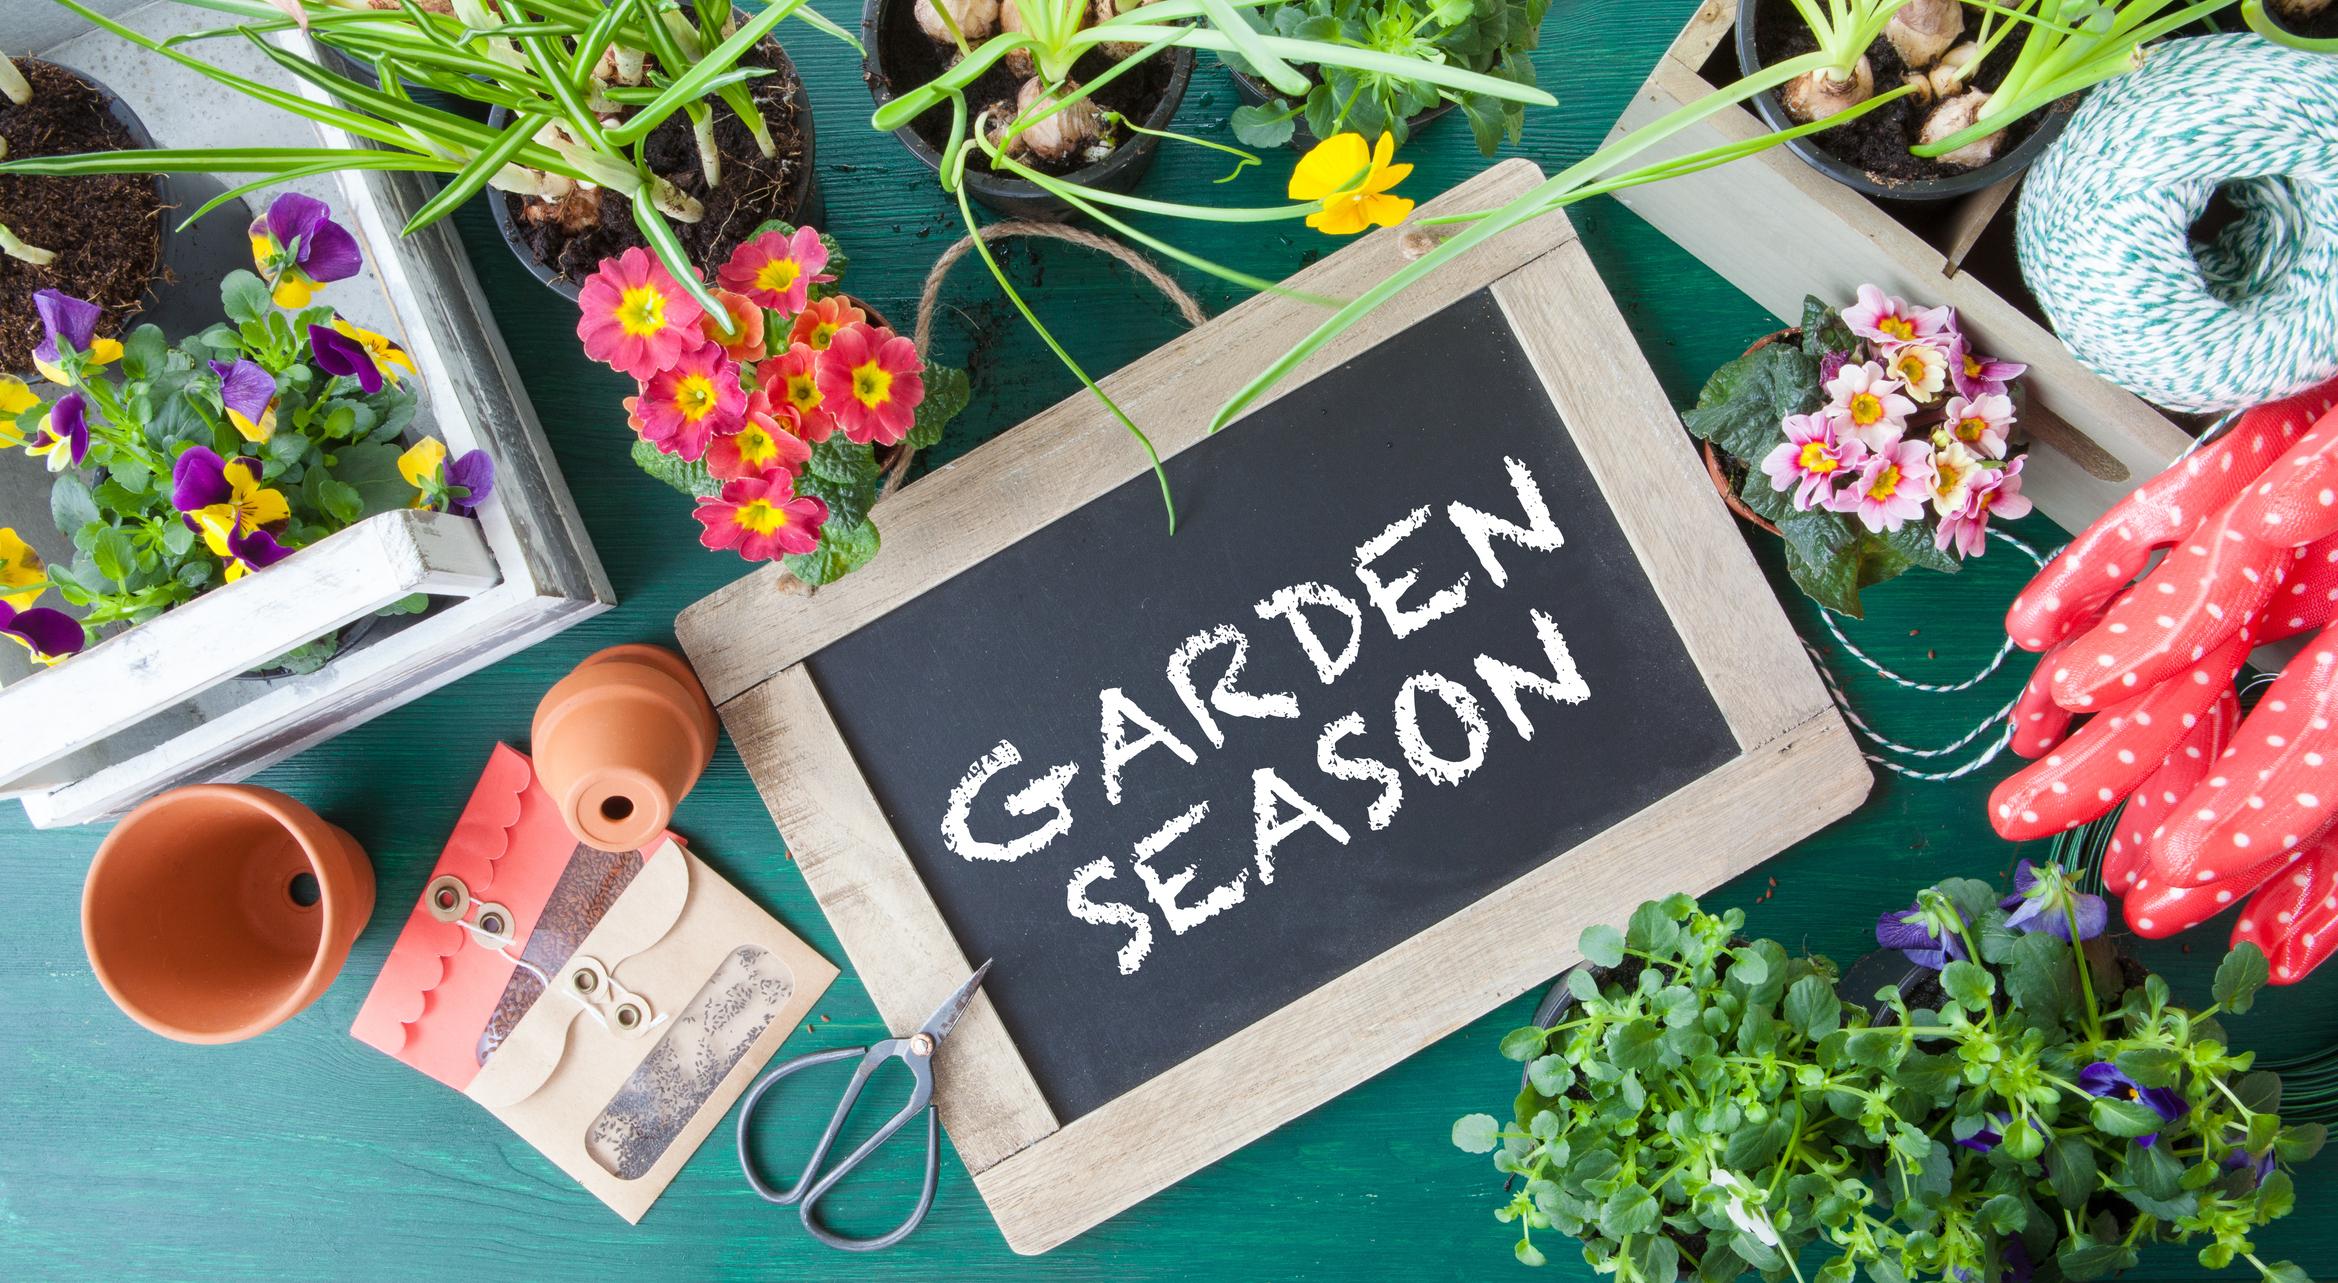 Garden Shed Season